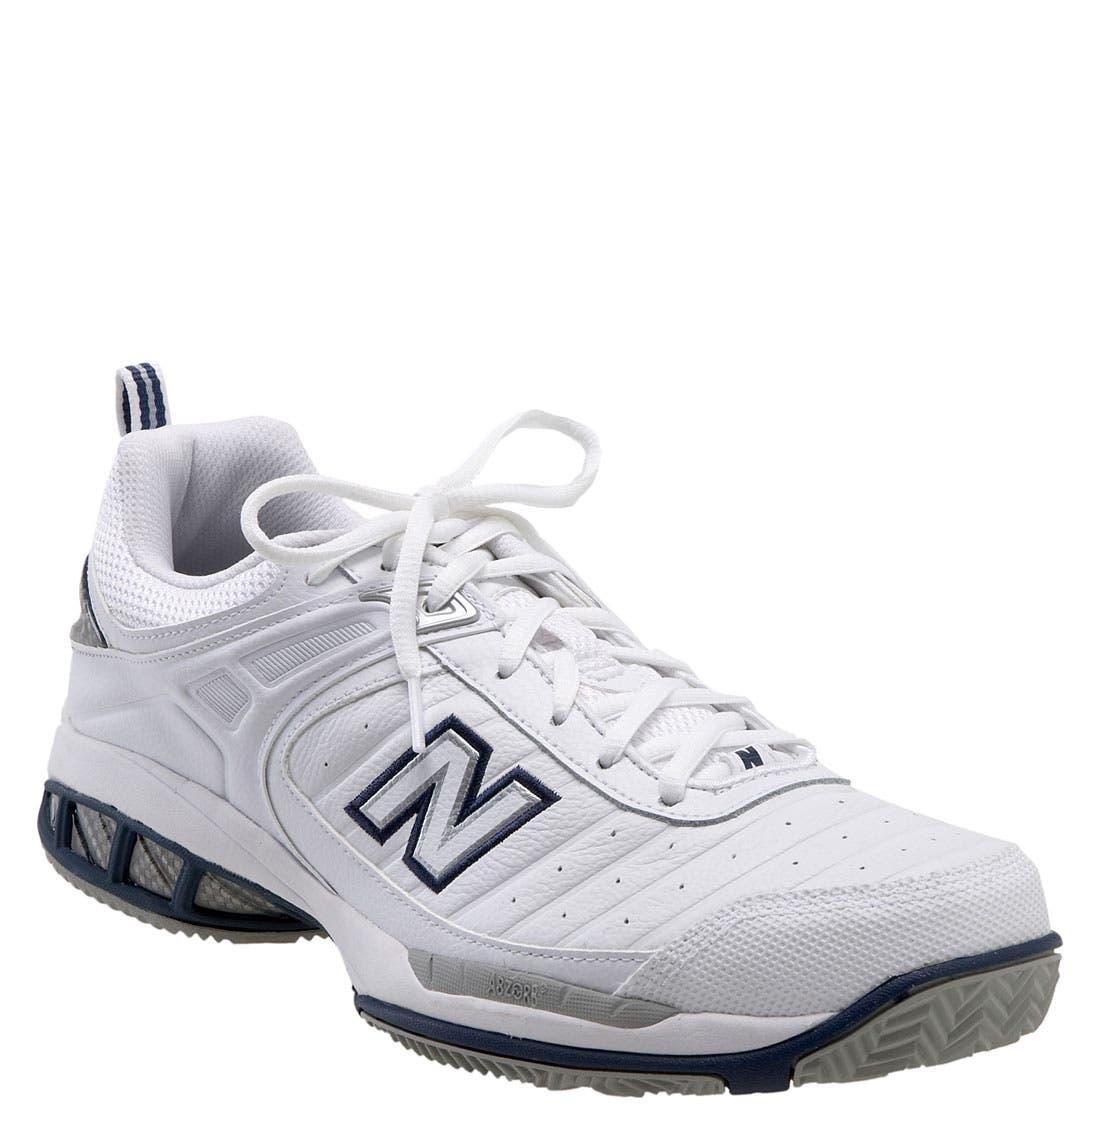 Alternate Image 1 Selected - New Balance '804' Tennis Shoe (Men)